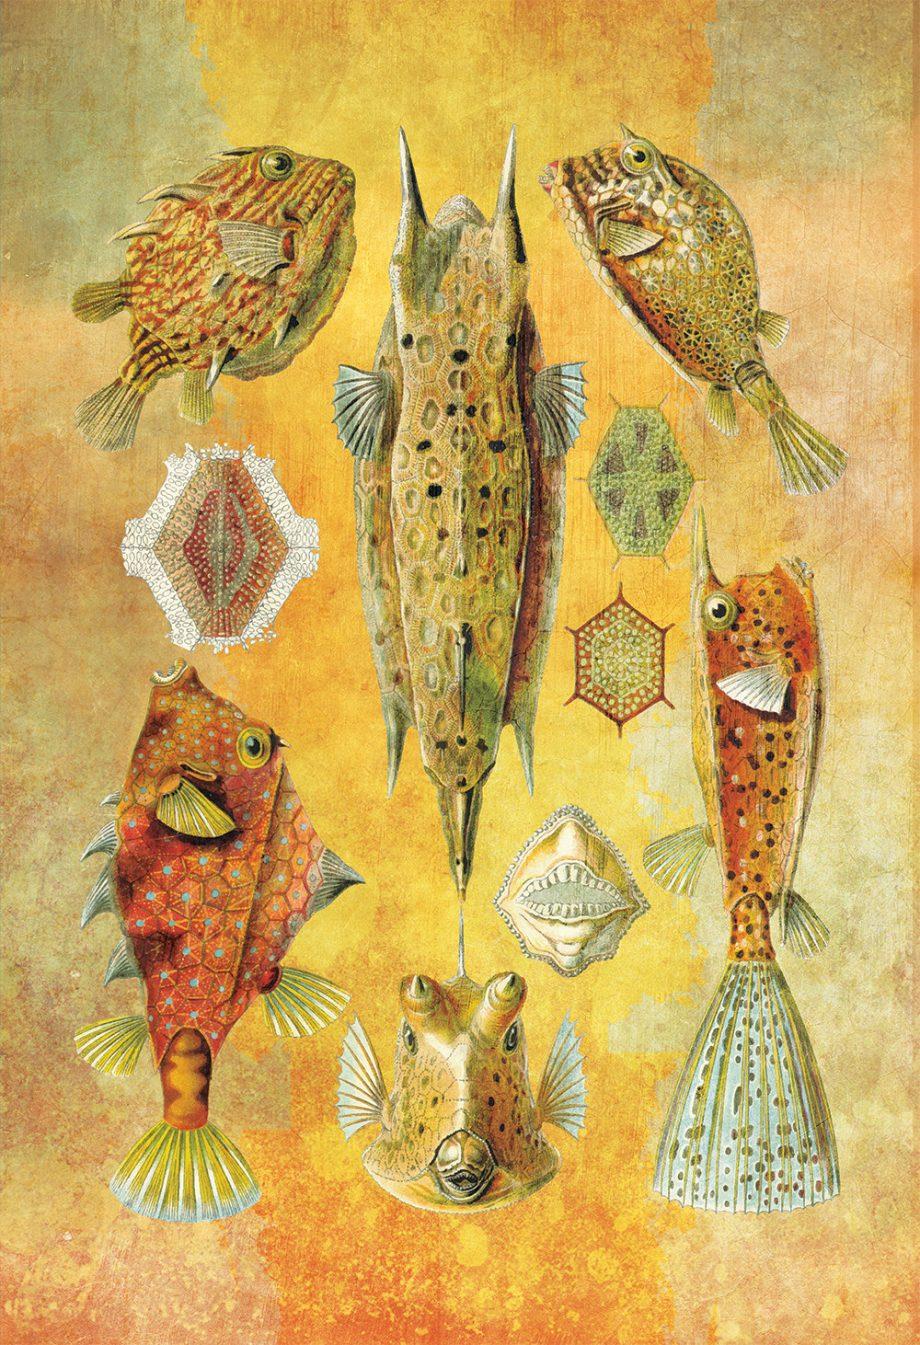 Ernst Haeckel Ostraciontes Print Boxfish Art Vintage Nautical Decor Ocean Wall Art - Giclee Print on Cotton Canvas and Paper Canvas